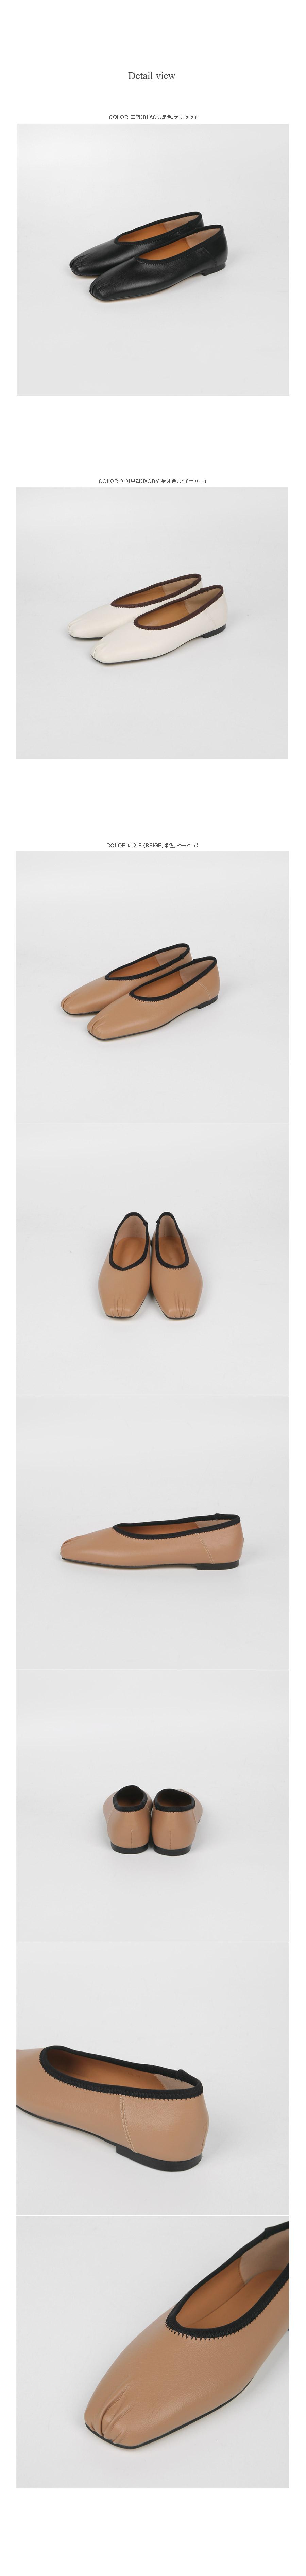 Corse flat shoes black 240 / ivory 235